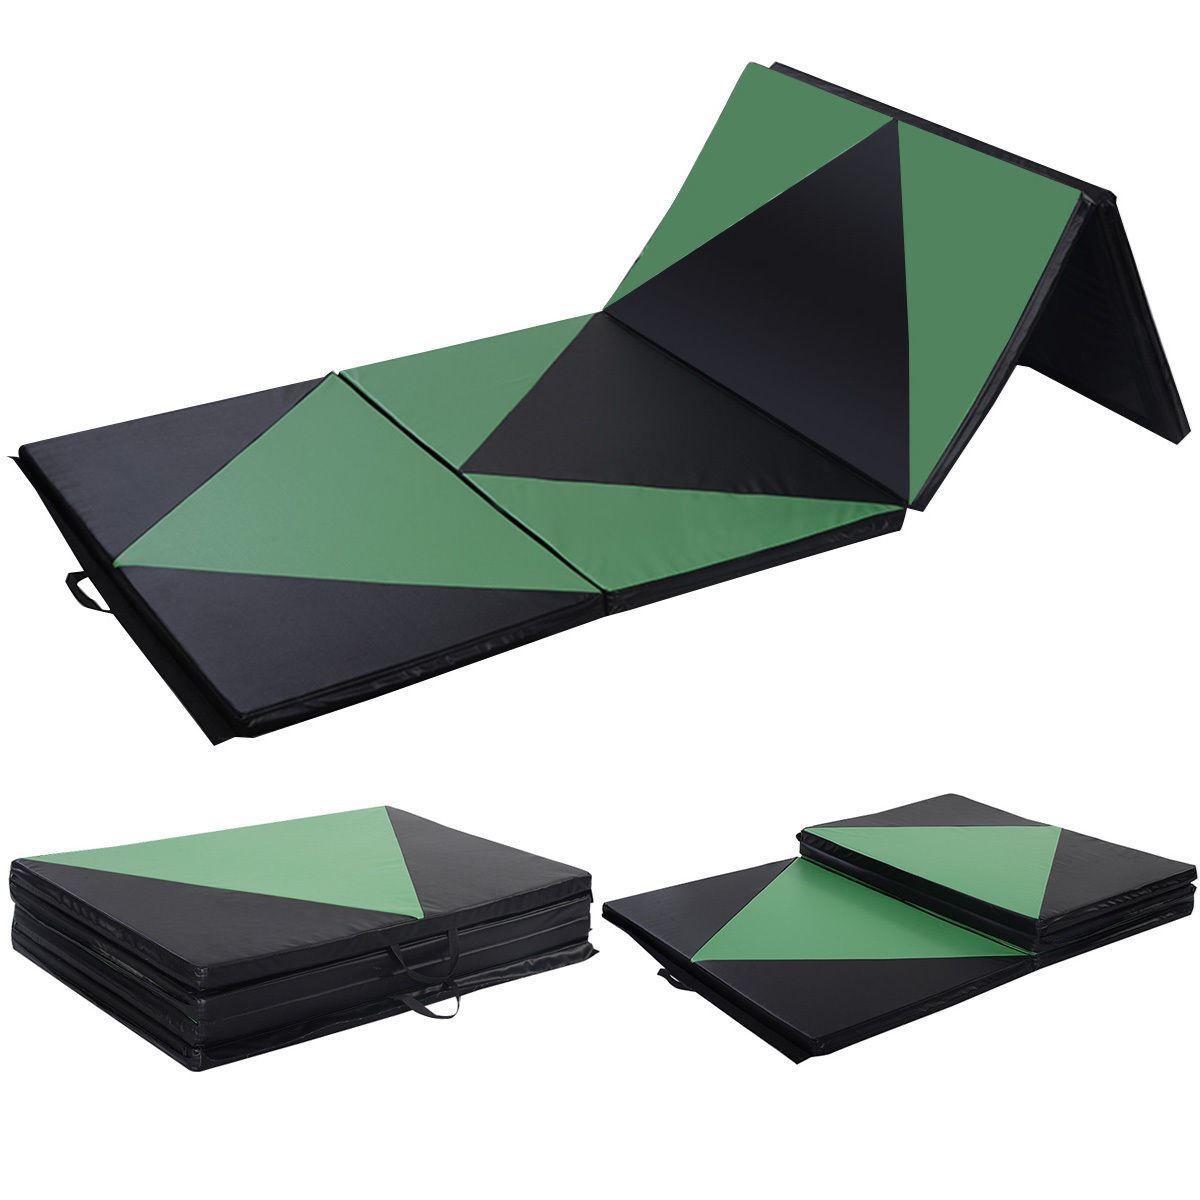 "Picture of Folding Tumbling Gymnastics Mat Green / Black - 4' x 10' x 2"""